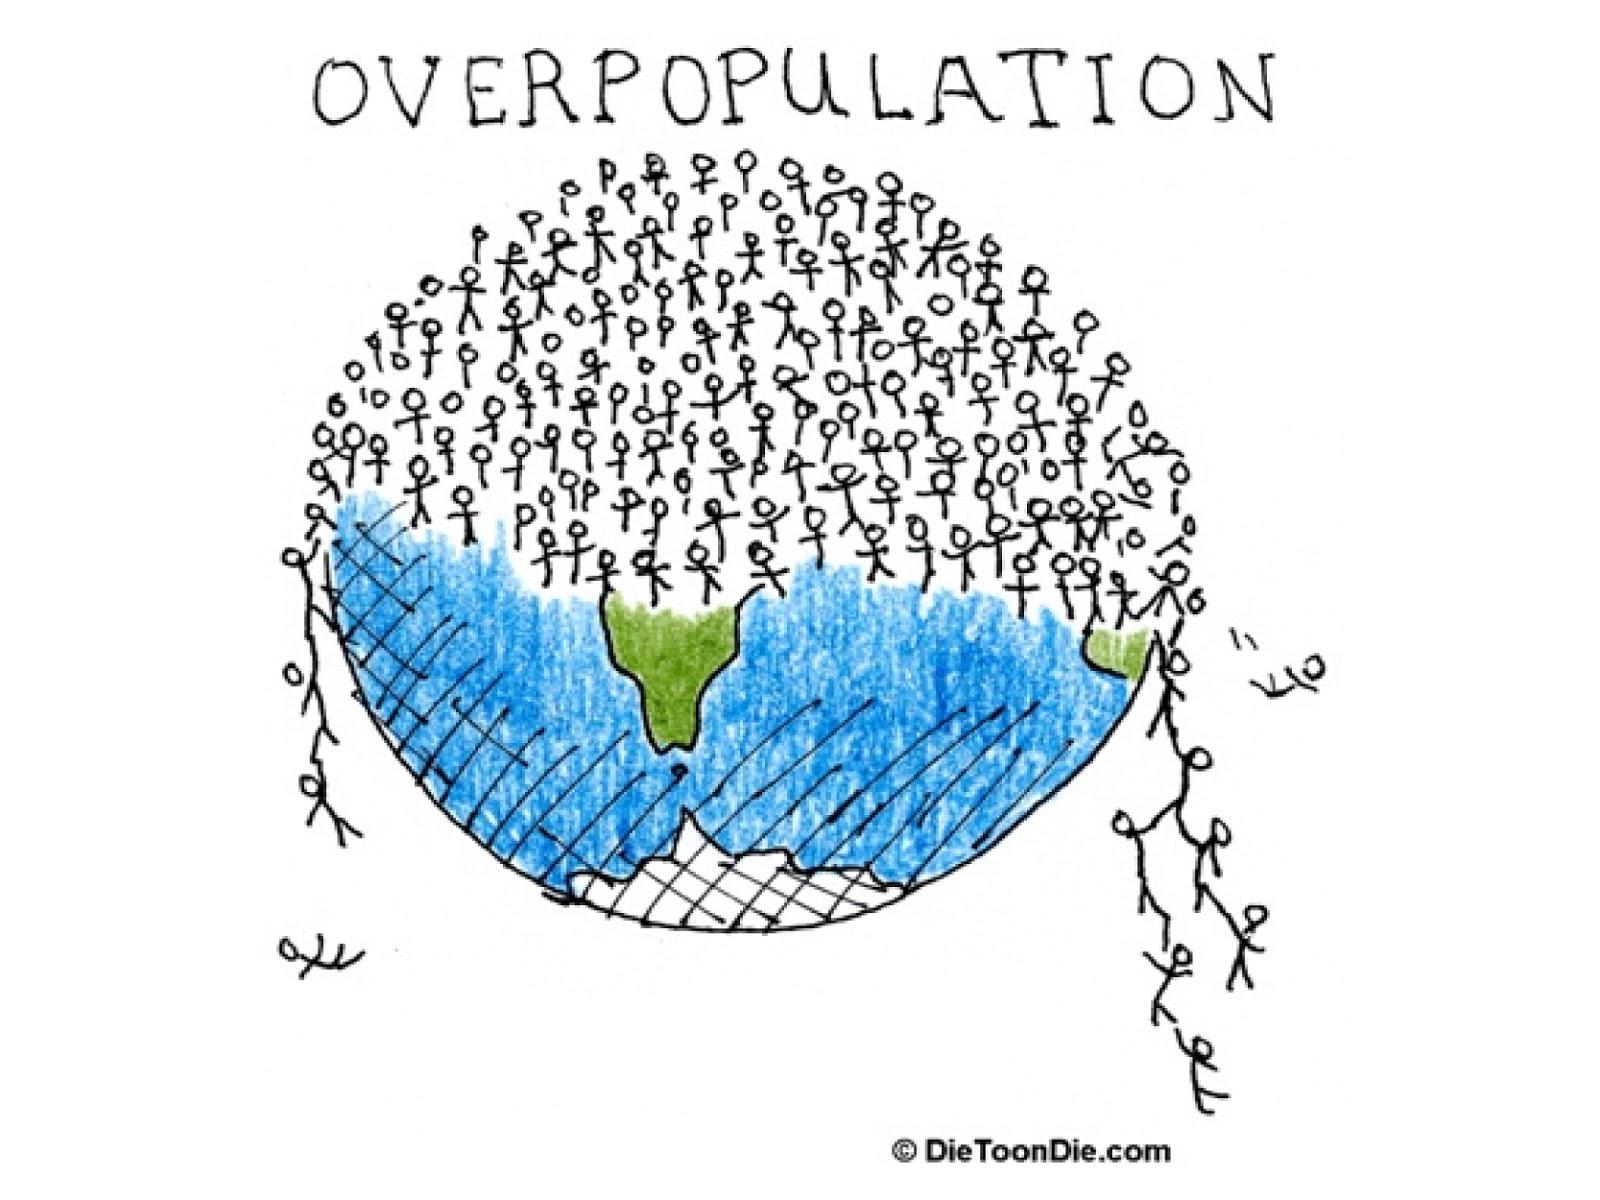 overpopulation essay report web fc com overpopulation essay